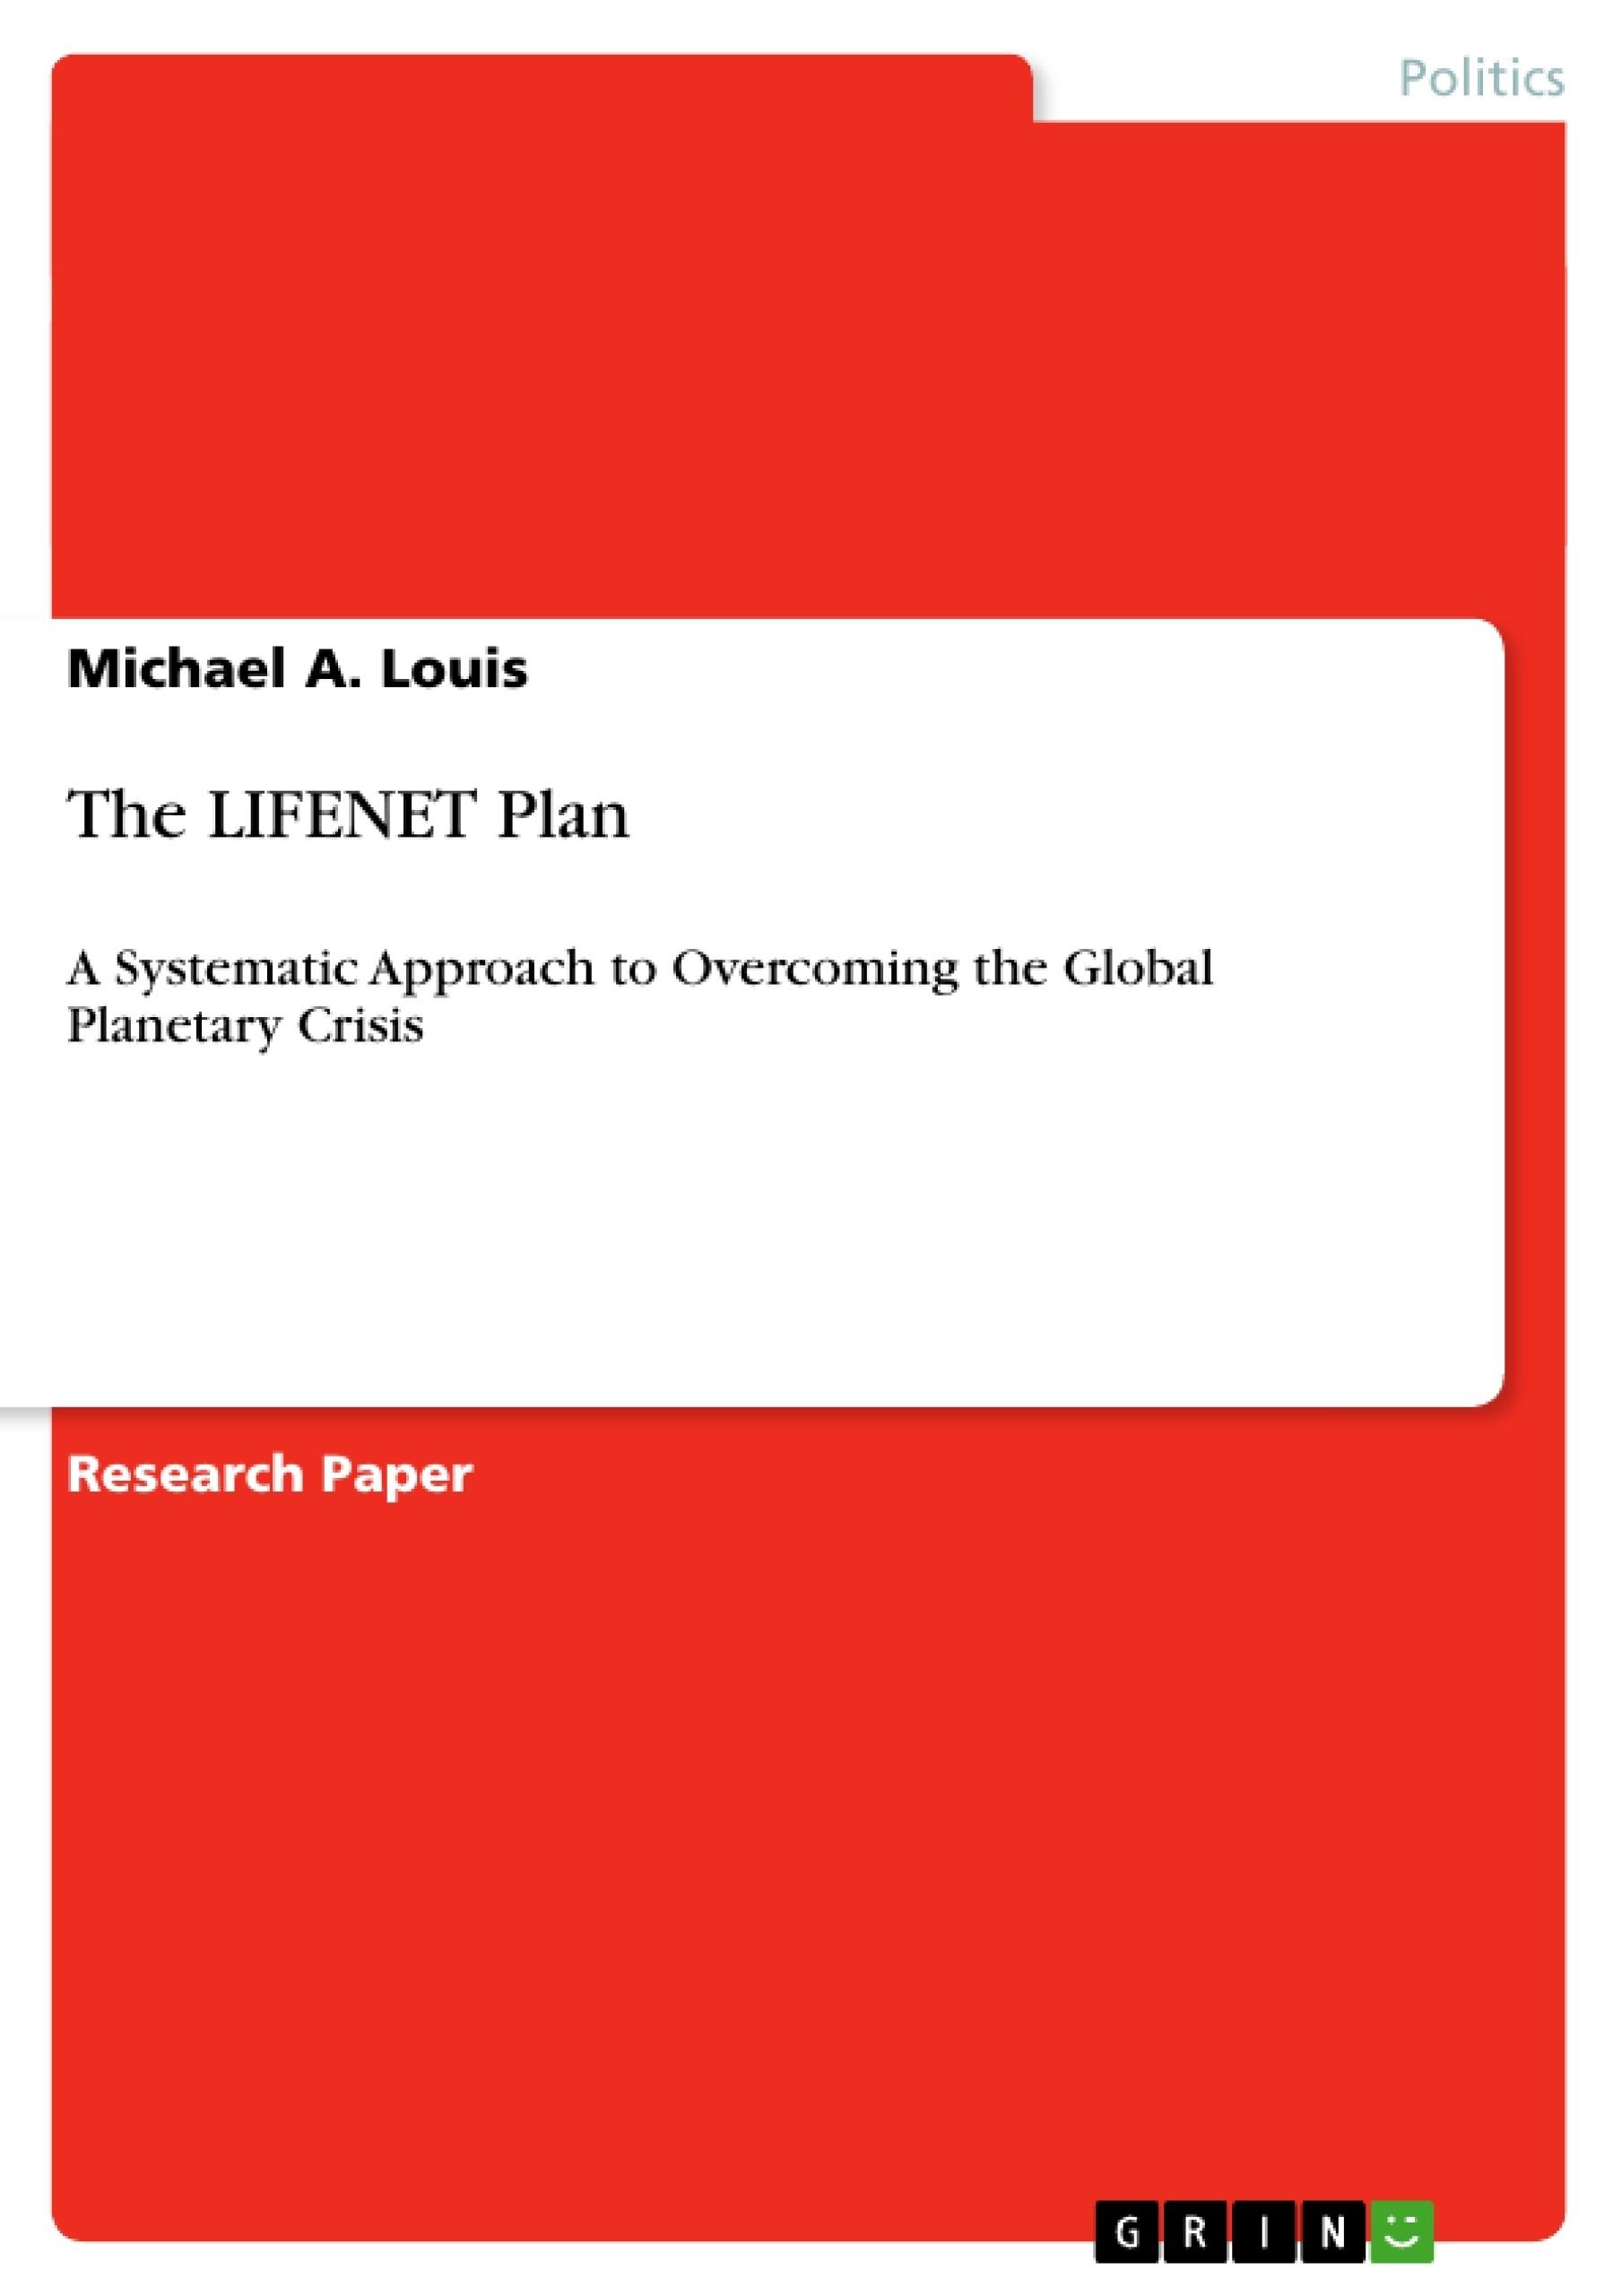 Title: The LIFENET Plan